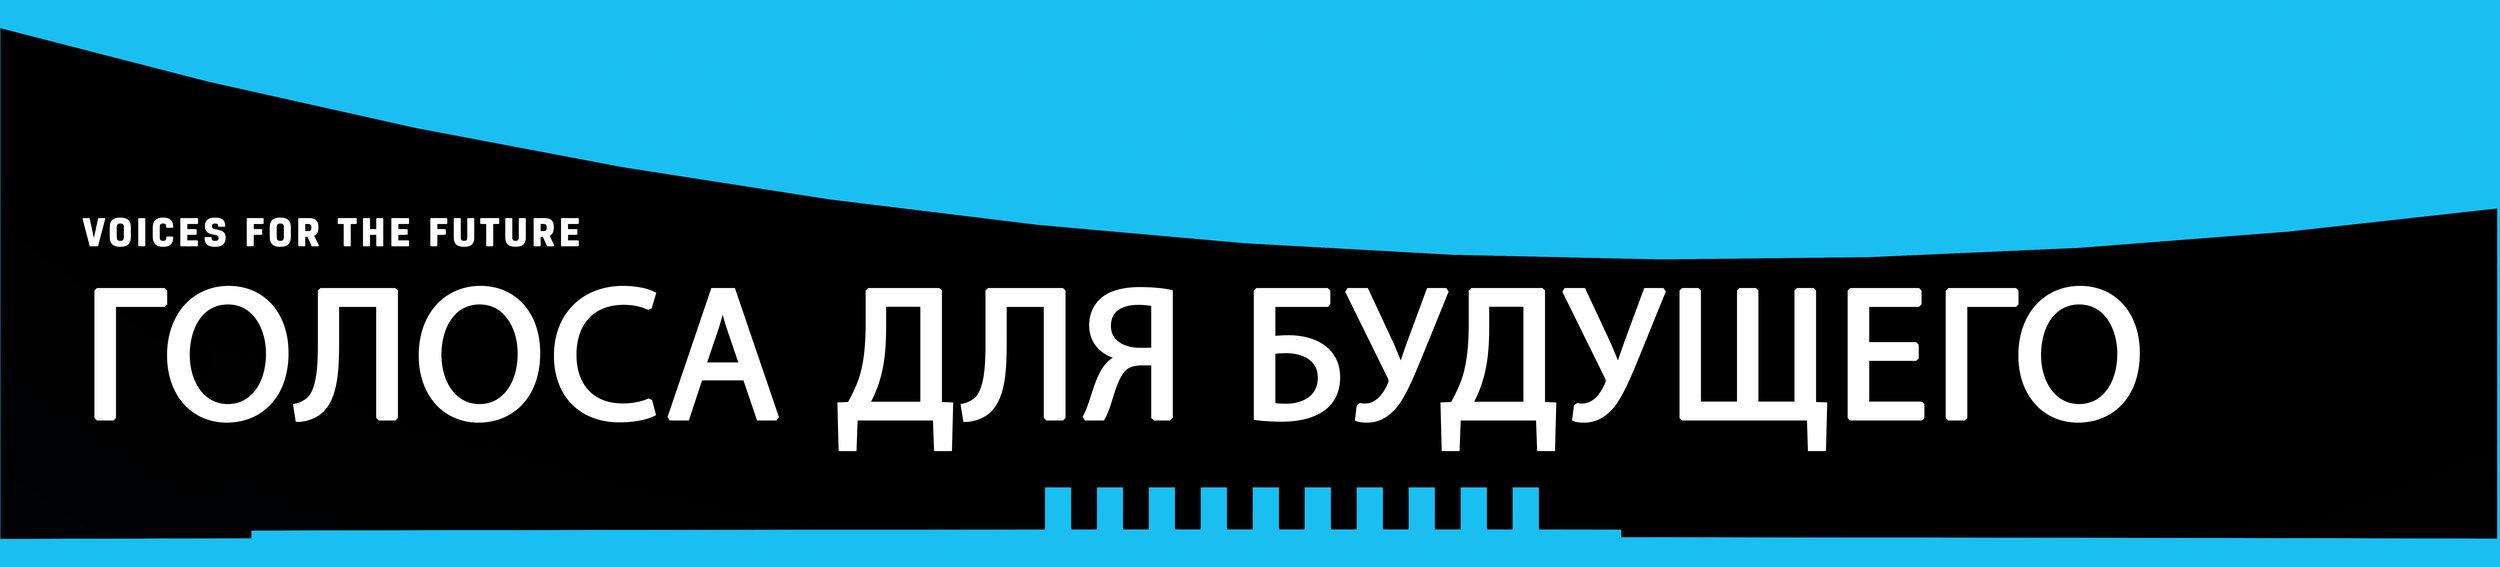 UN_NYC_VoicesOfTheFuture_Russian.jpg